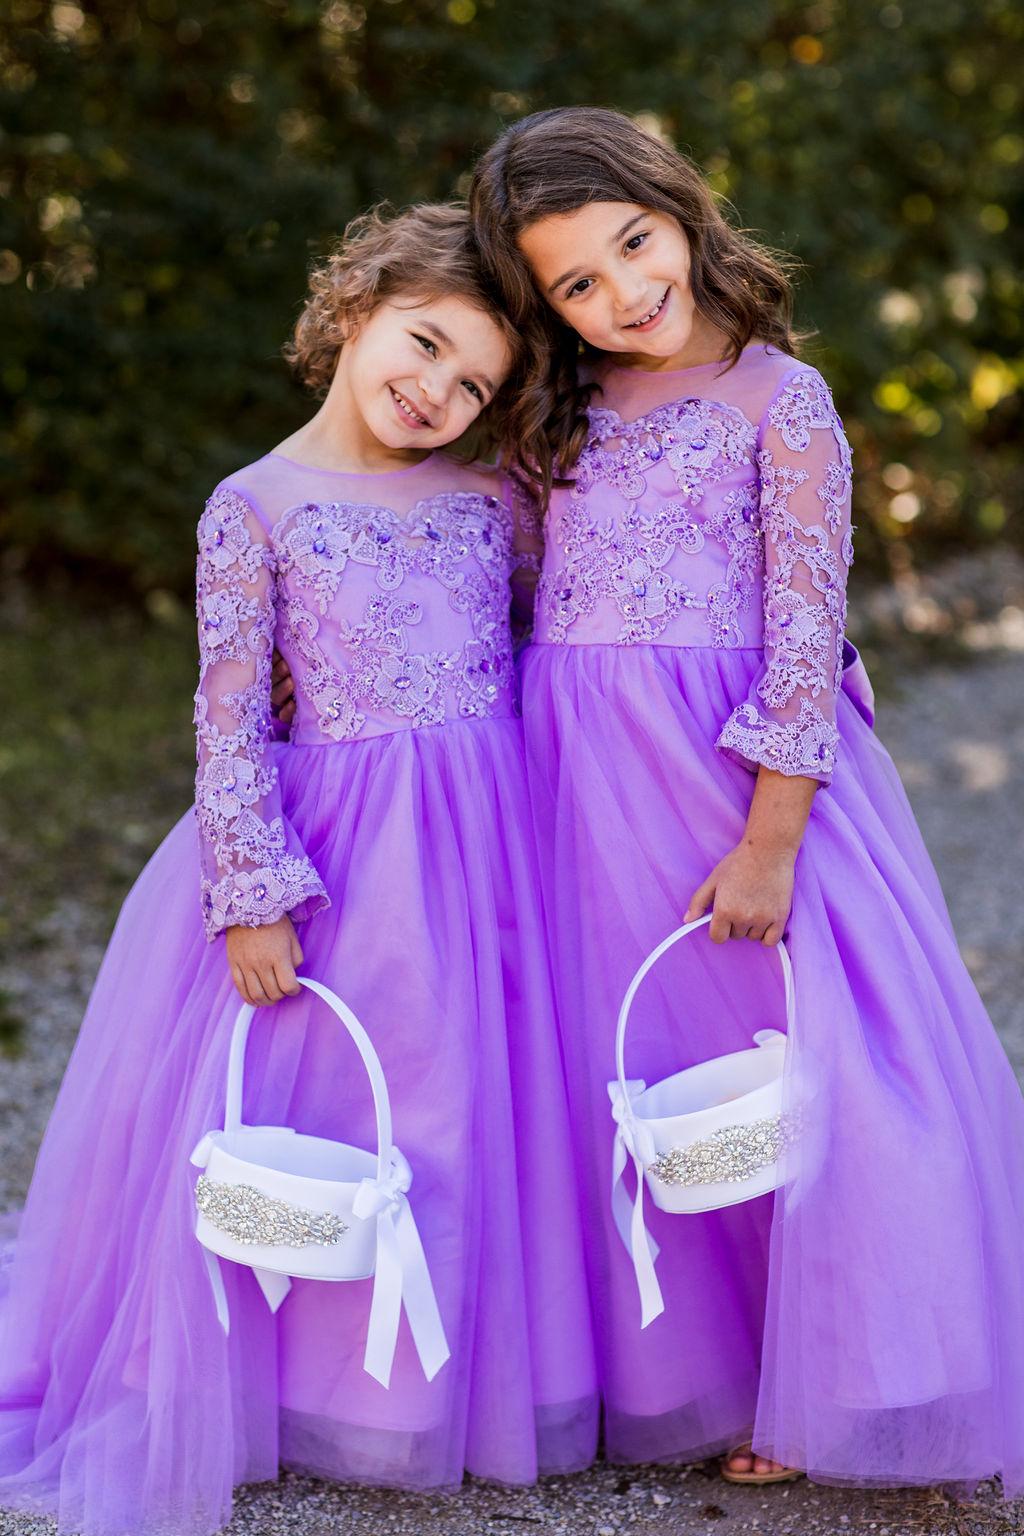 Lavender flower girl dresses | Nashville Bride Guide